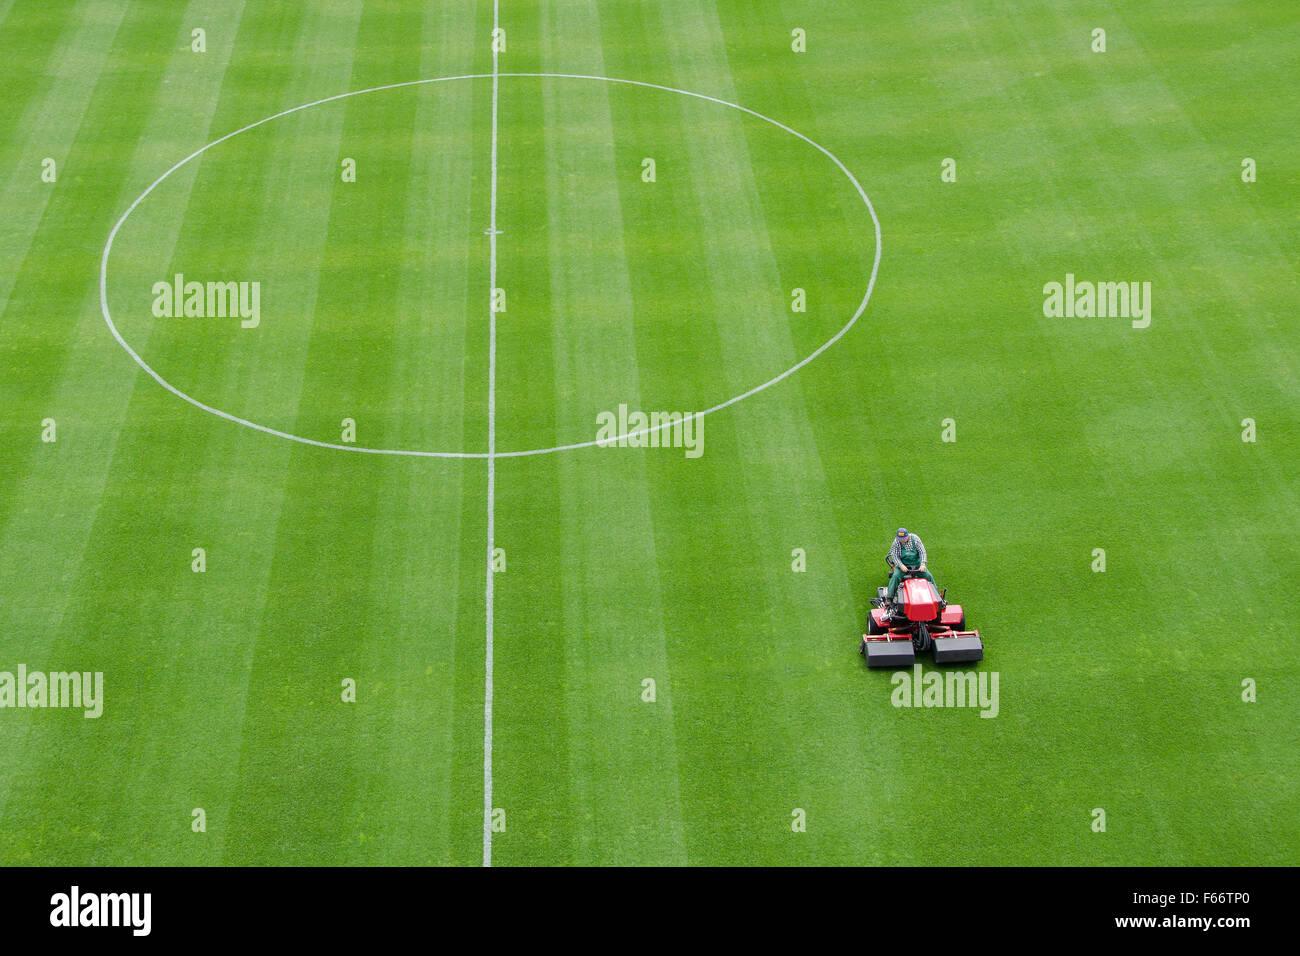 Rasenmahen Auf Dem Fussballplatz Stockfoto Bild 89890920